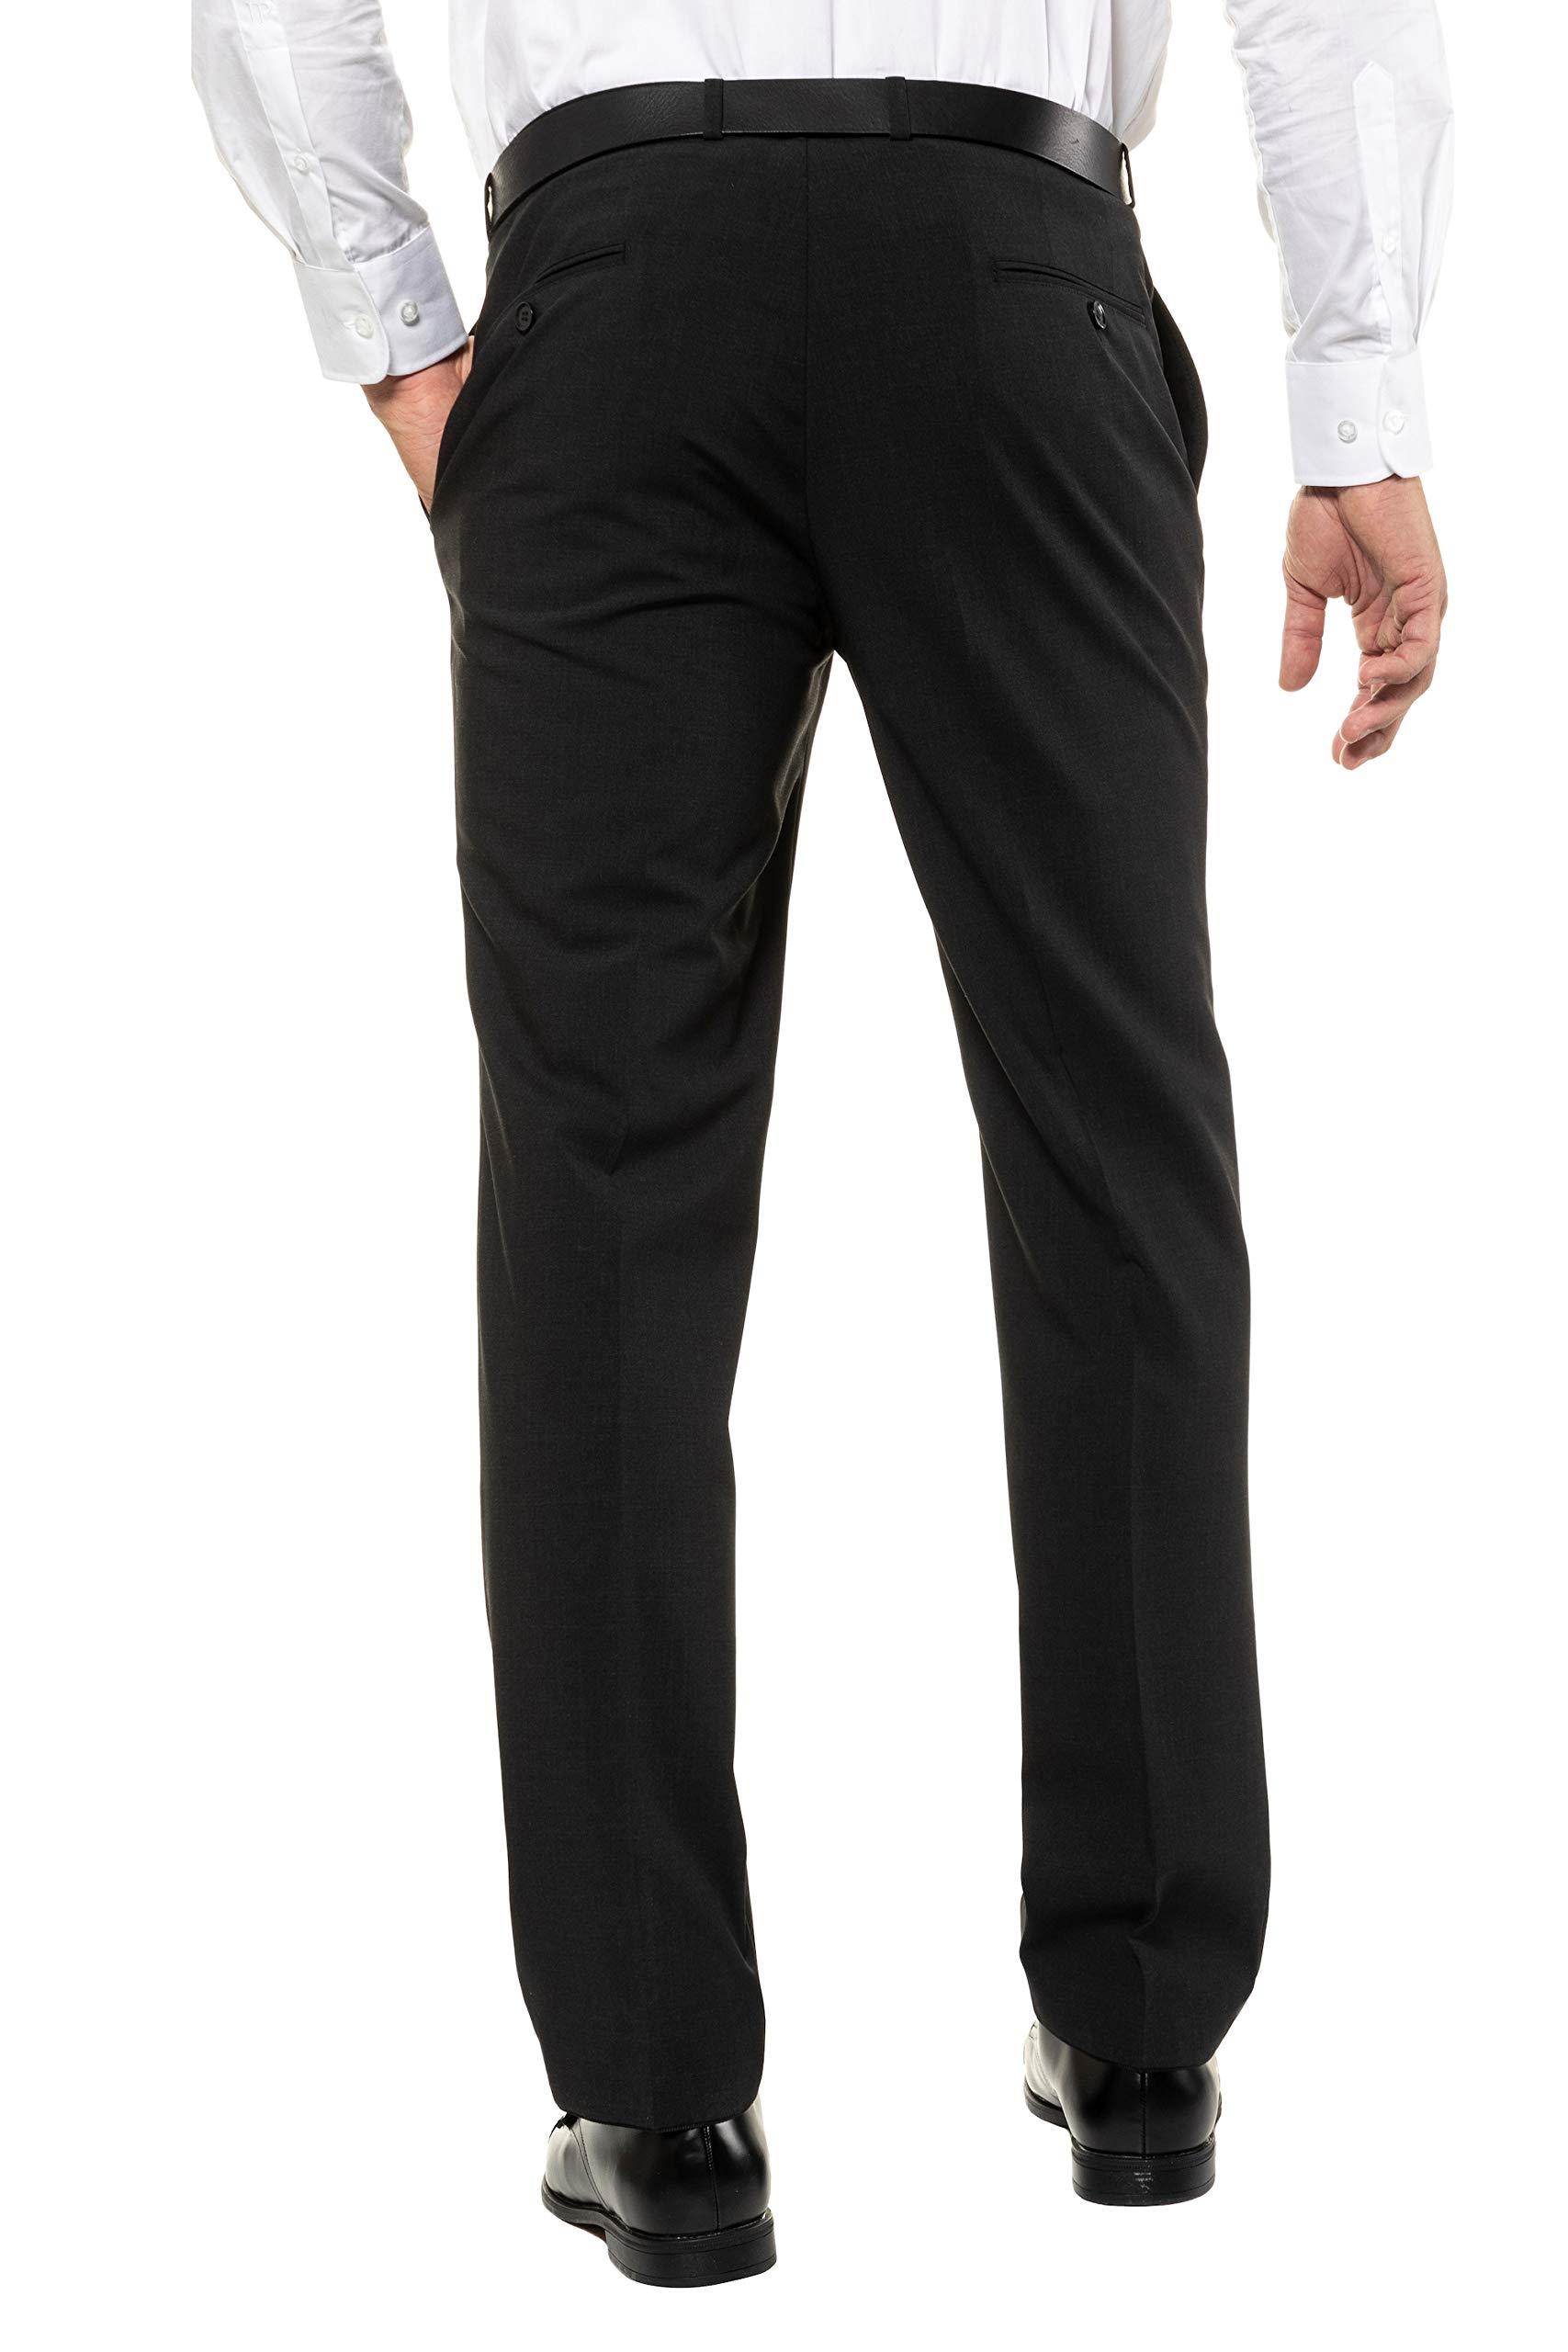 JP 1880 Mens Big /& Tall Comfort Fit Wool Blend Suit Pants 715413